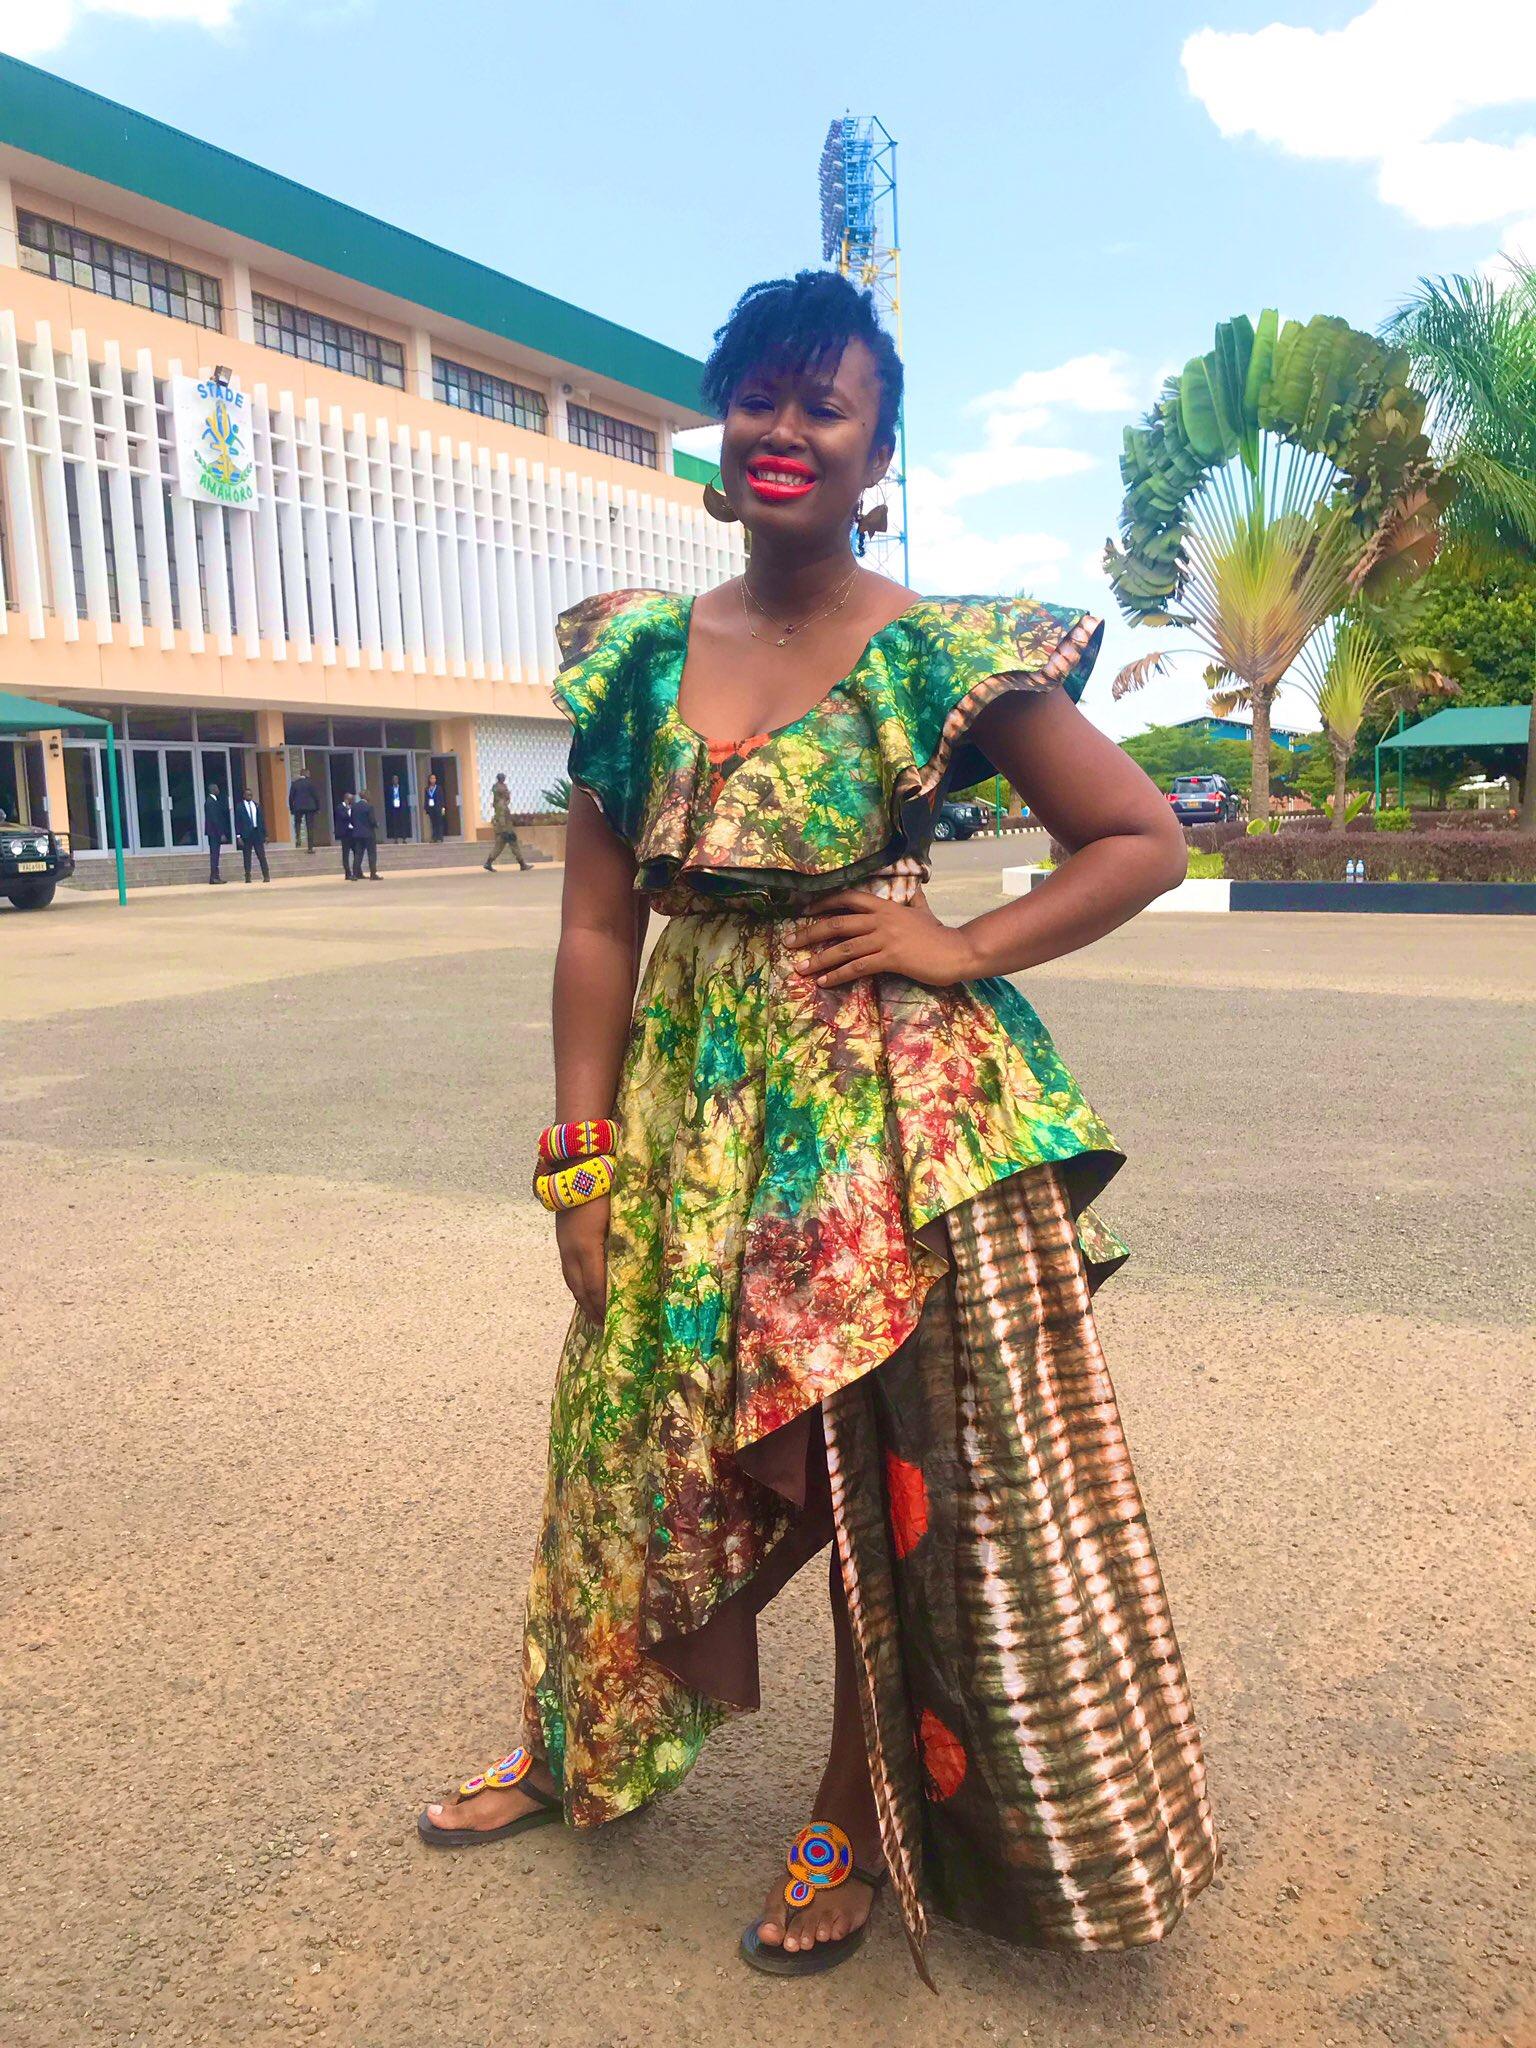 IMG_5910VickieRemoe-travel-kigali-rwanda-review-kwibohora25-hotels-africa.JPG